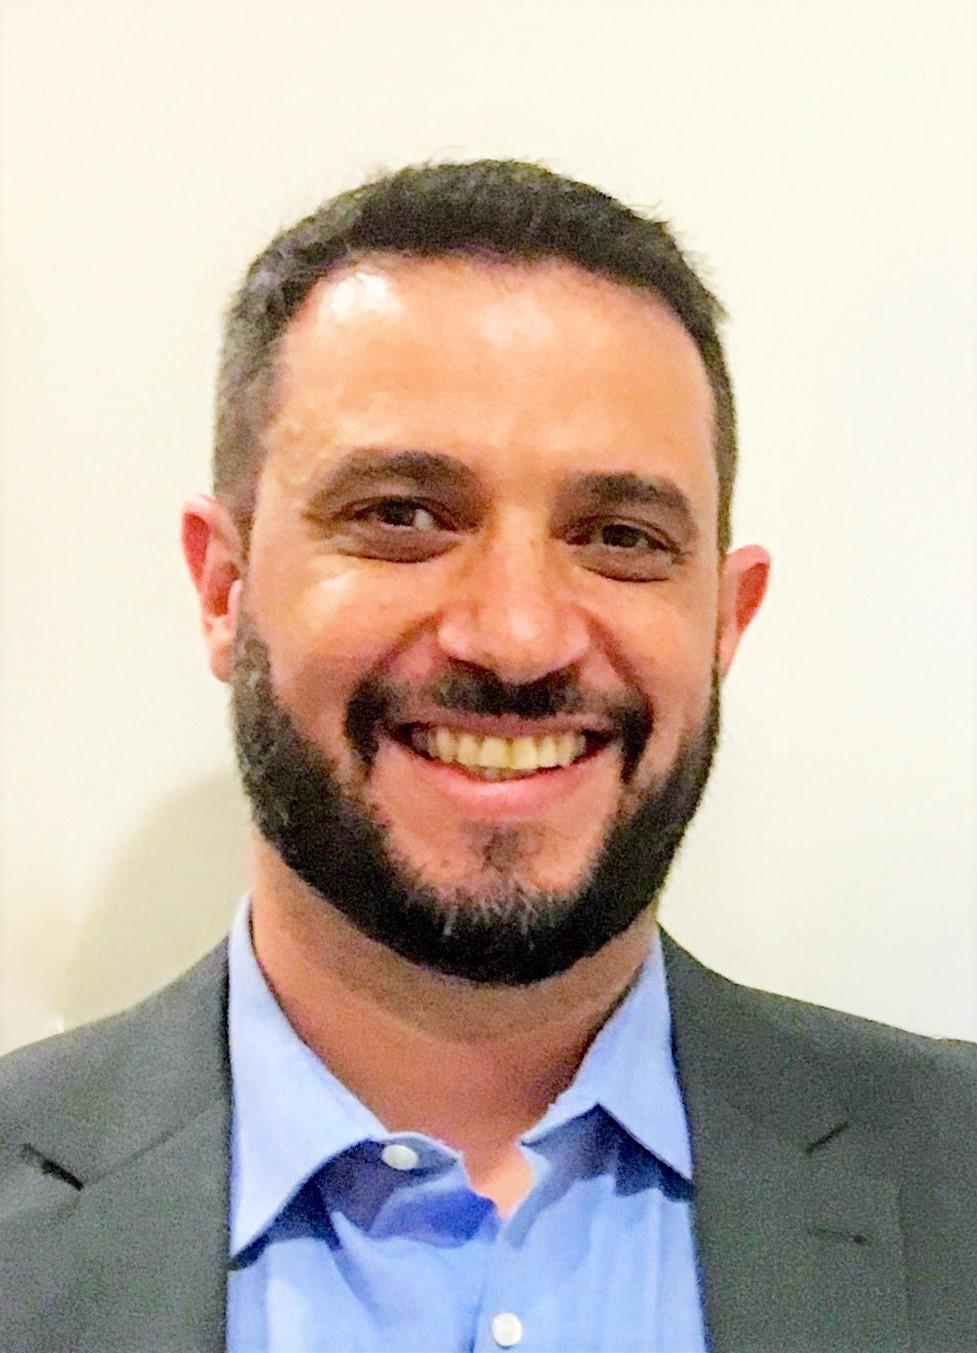 Fabio Alves HPC Sales Specialist for Latin America at Hewlett Packard Enterprise